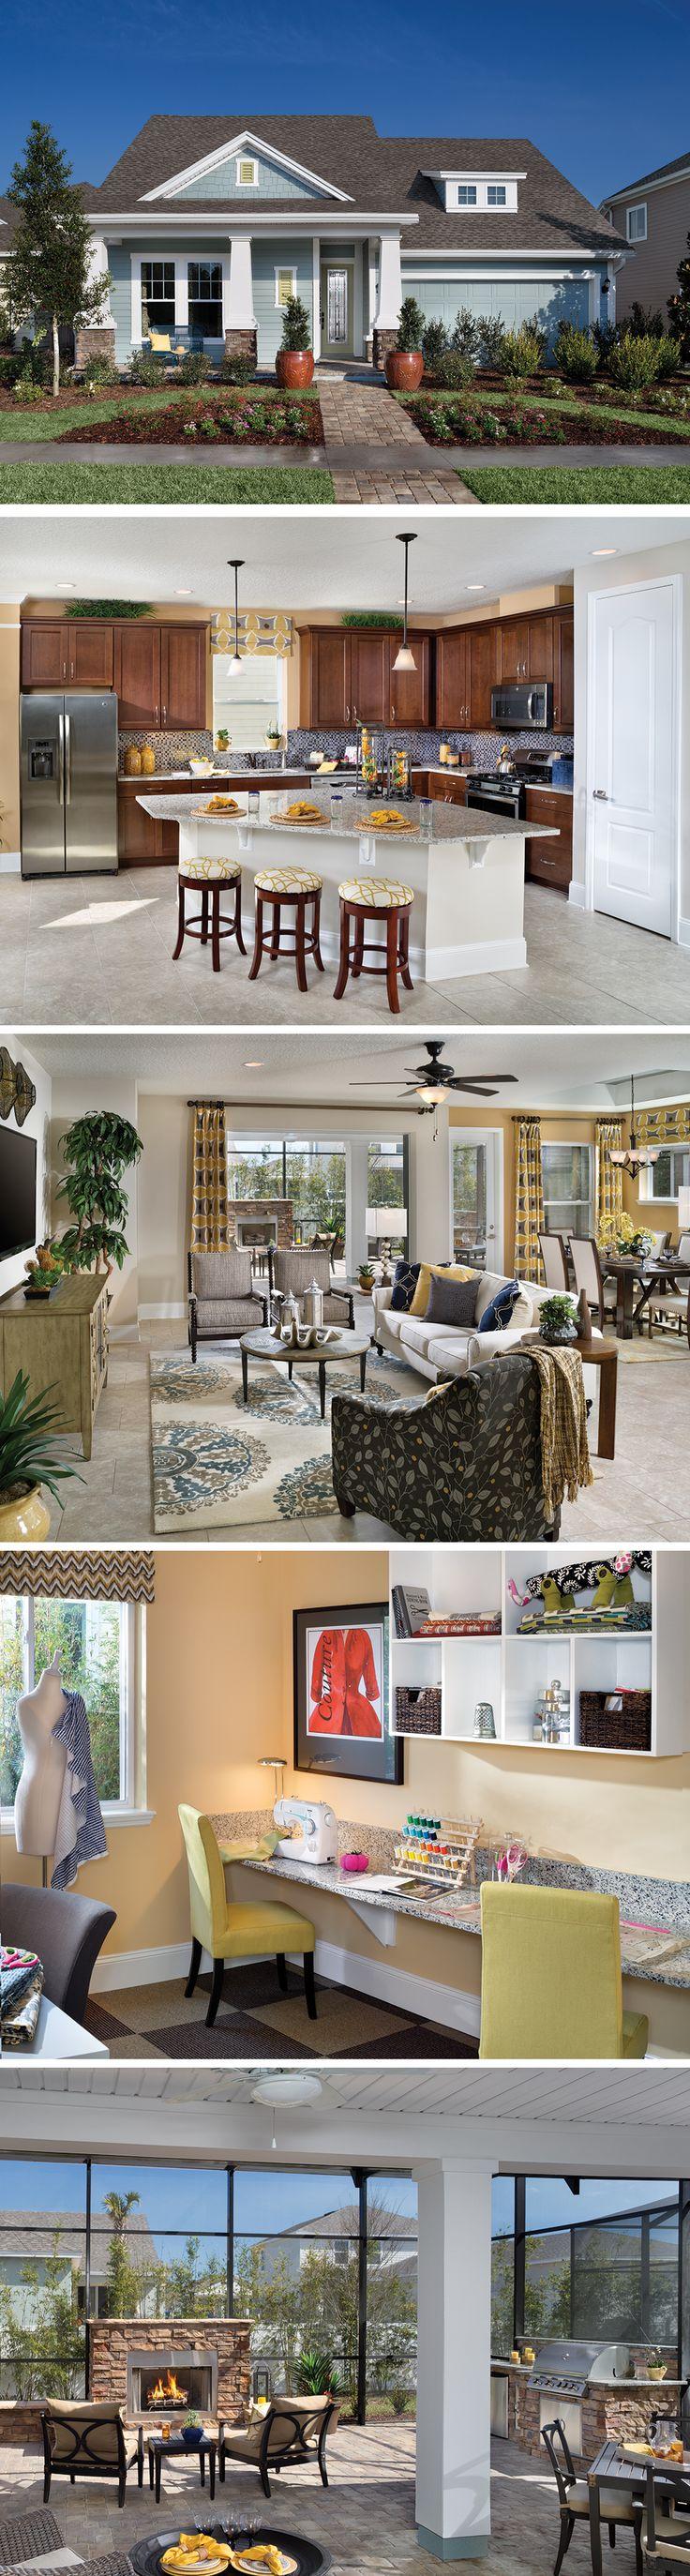 125 best home designs images on Pinterest